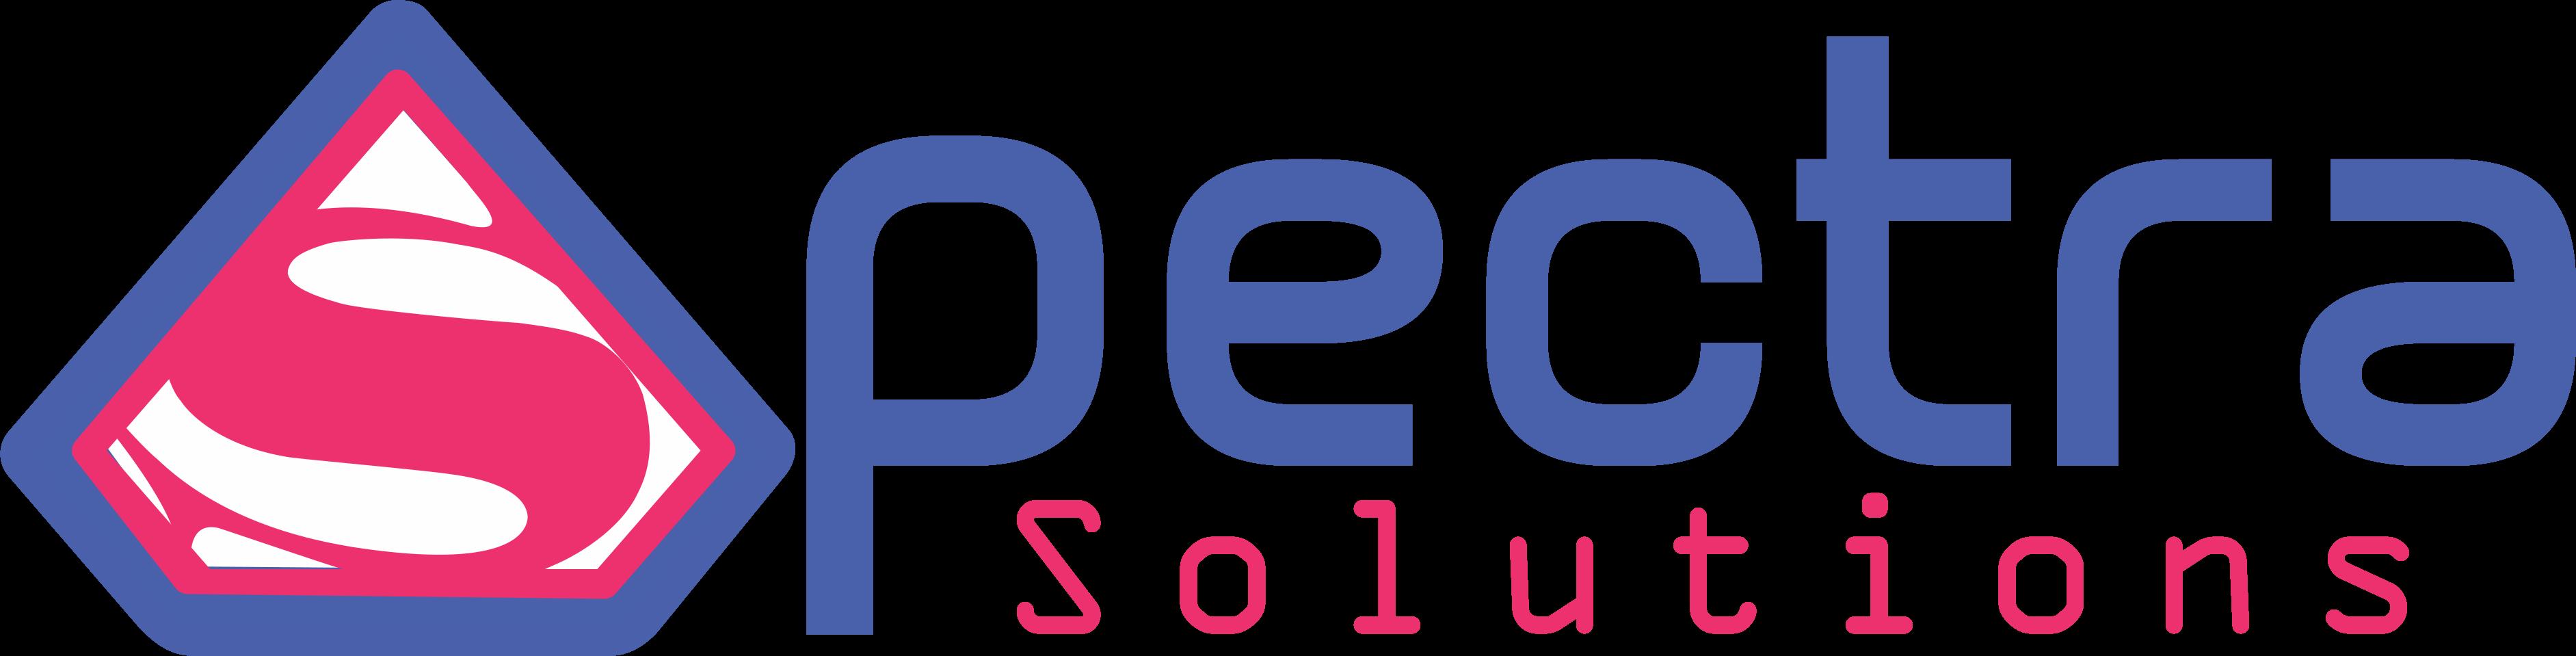 Spectra Solutions Logo